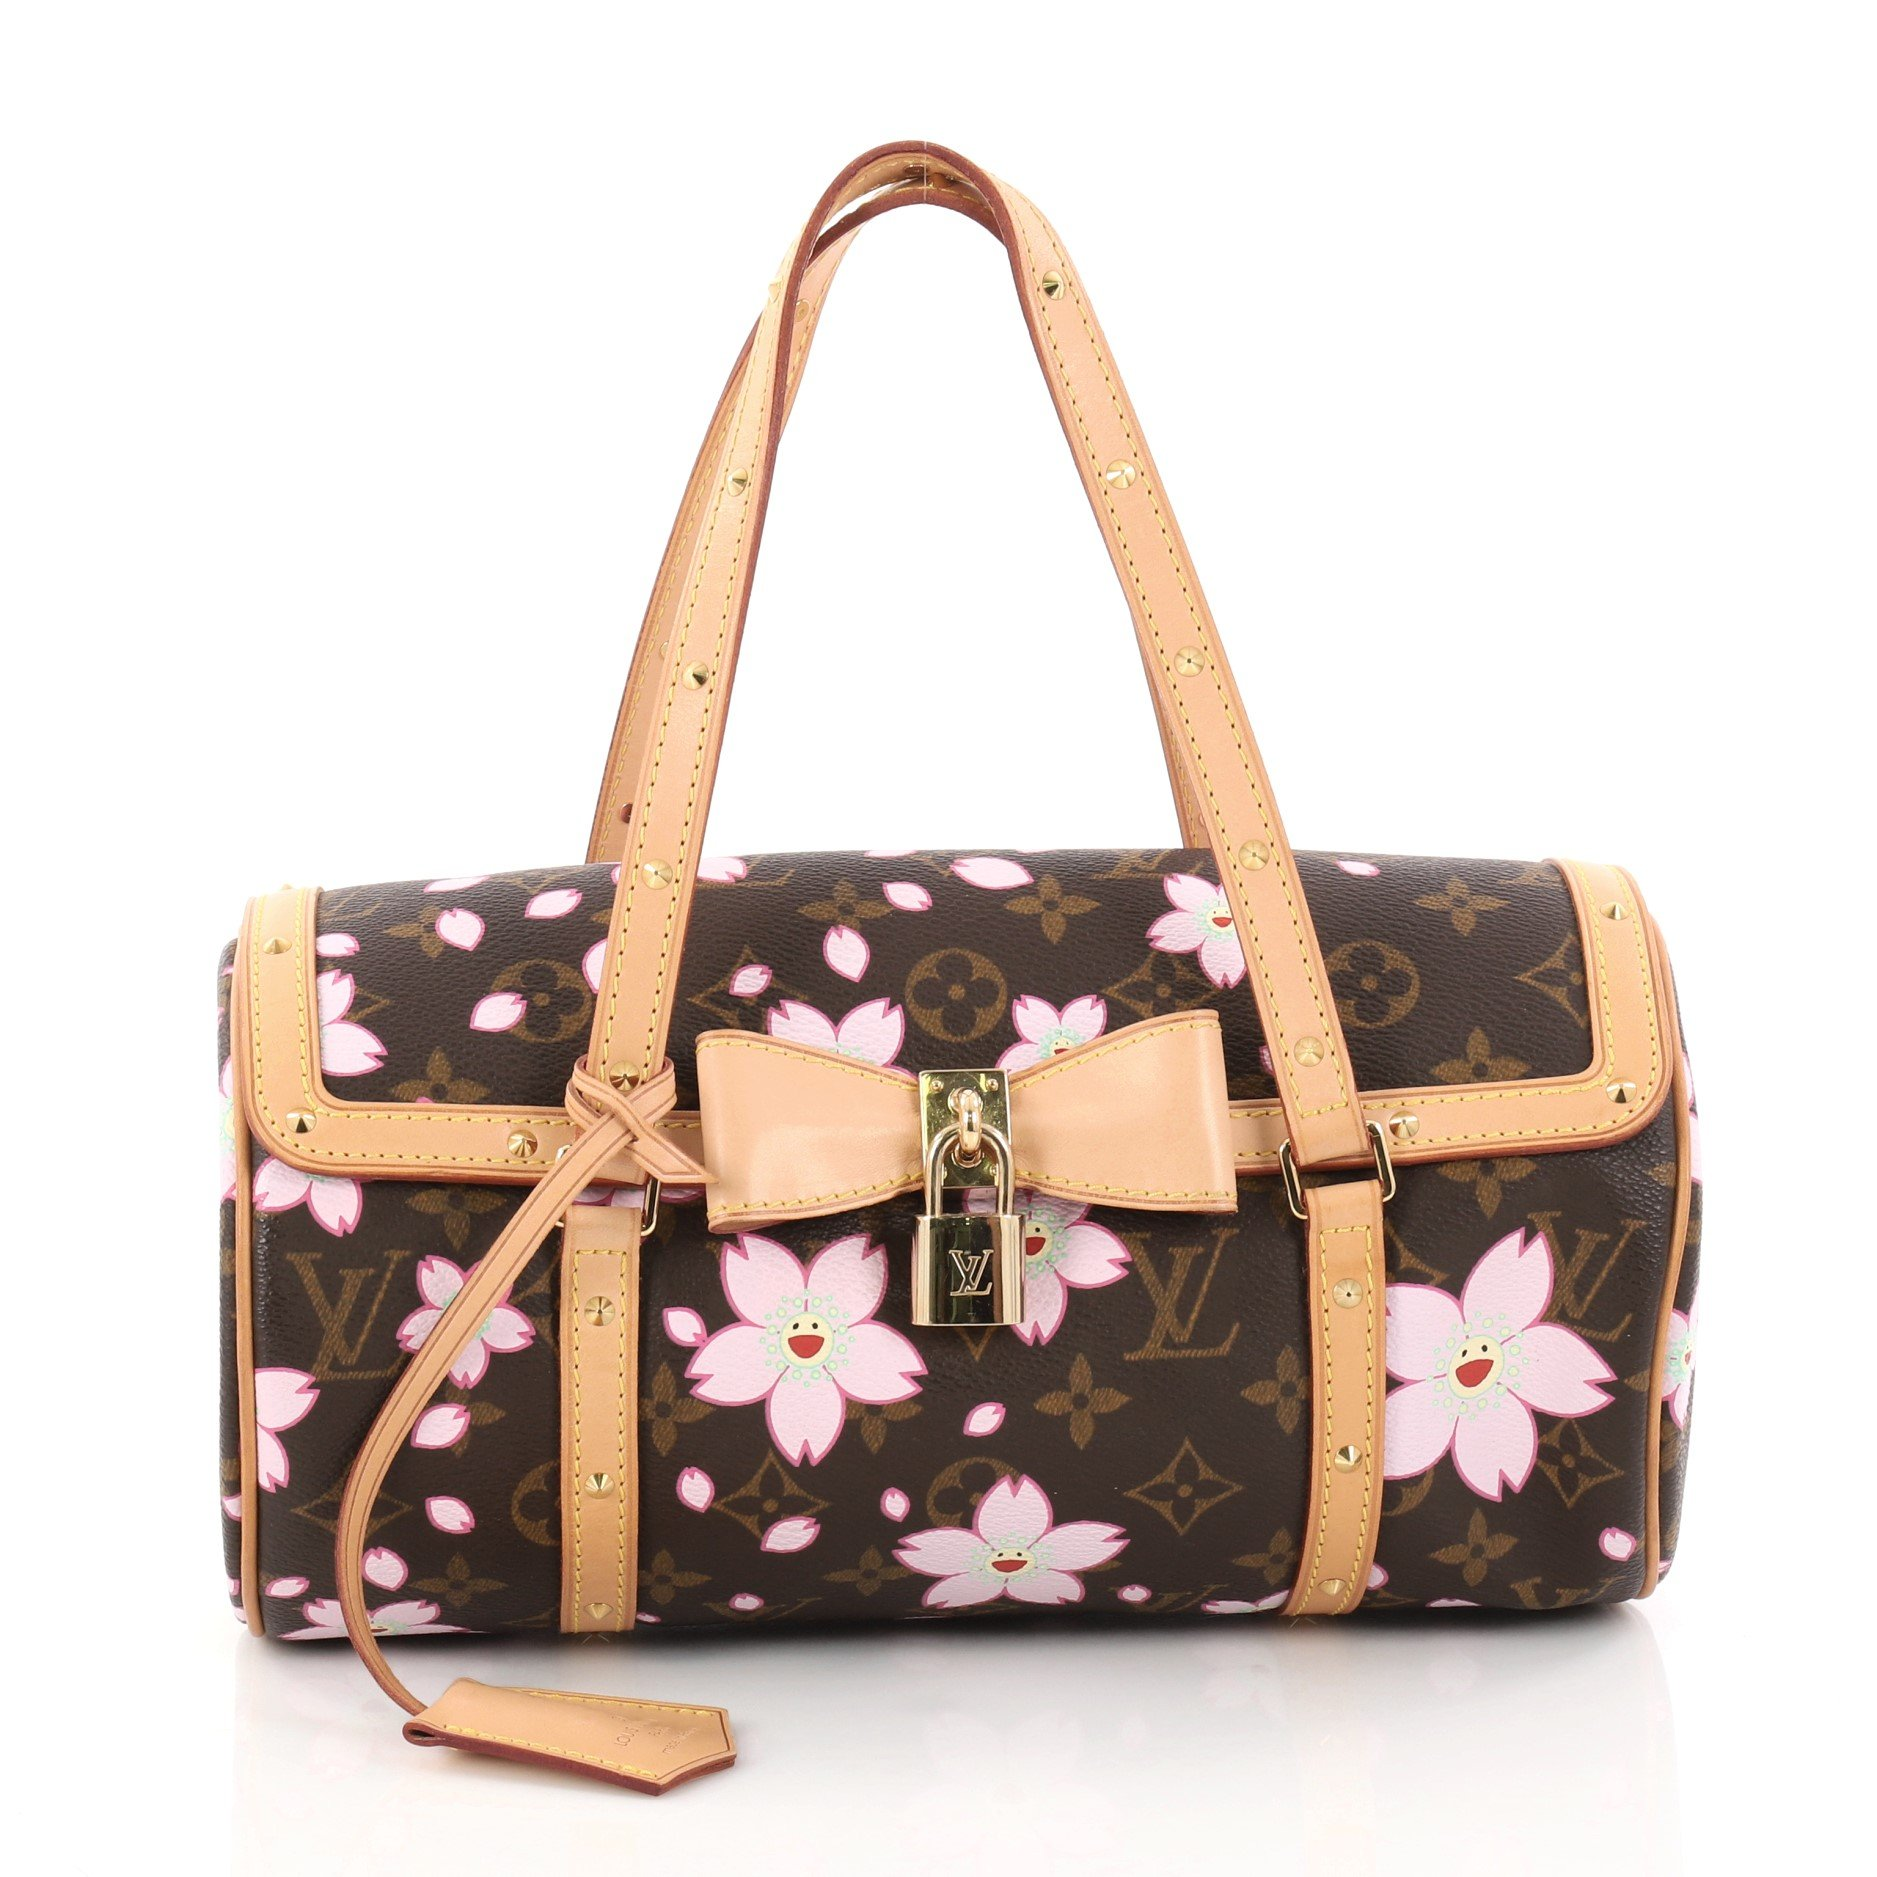 Louis Vuitton Papillon Handbag Cherry Blossom